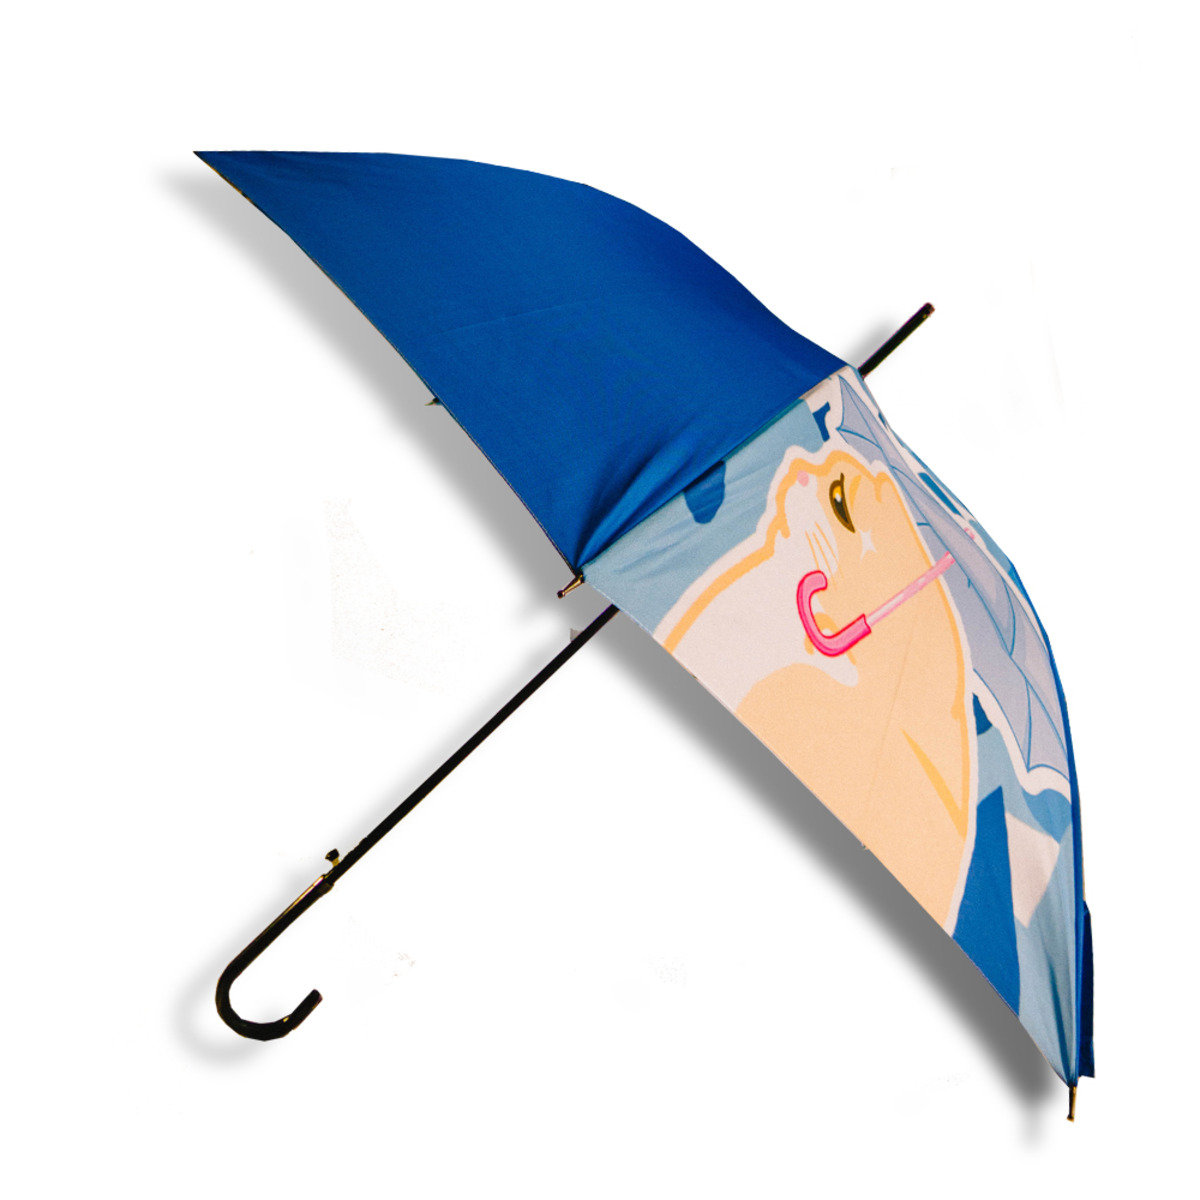 雨傘 (深藍色)